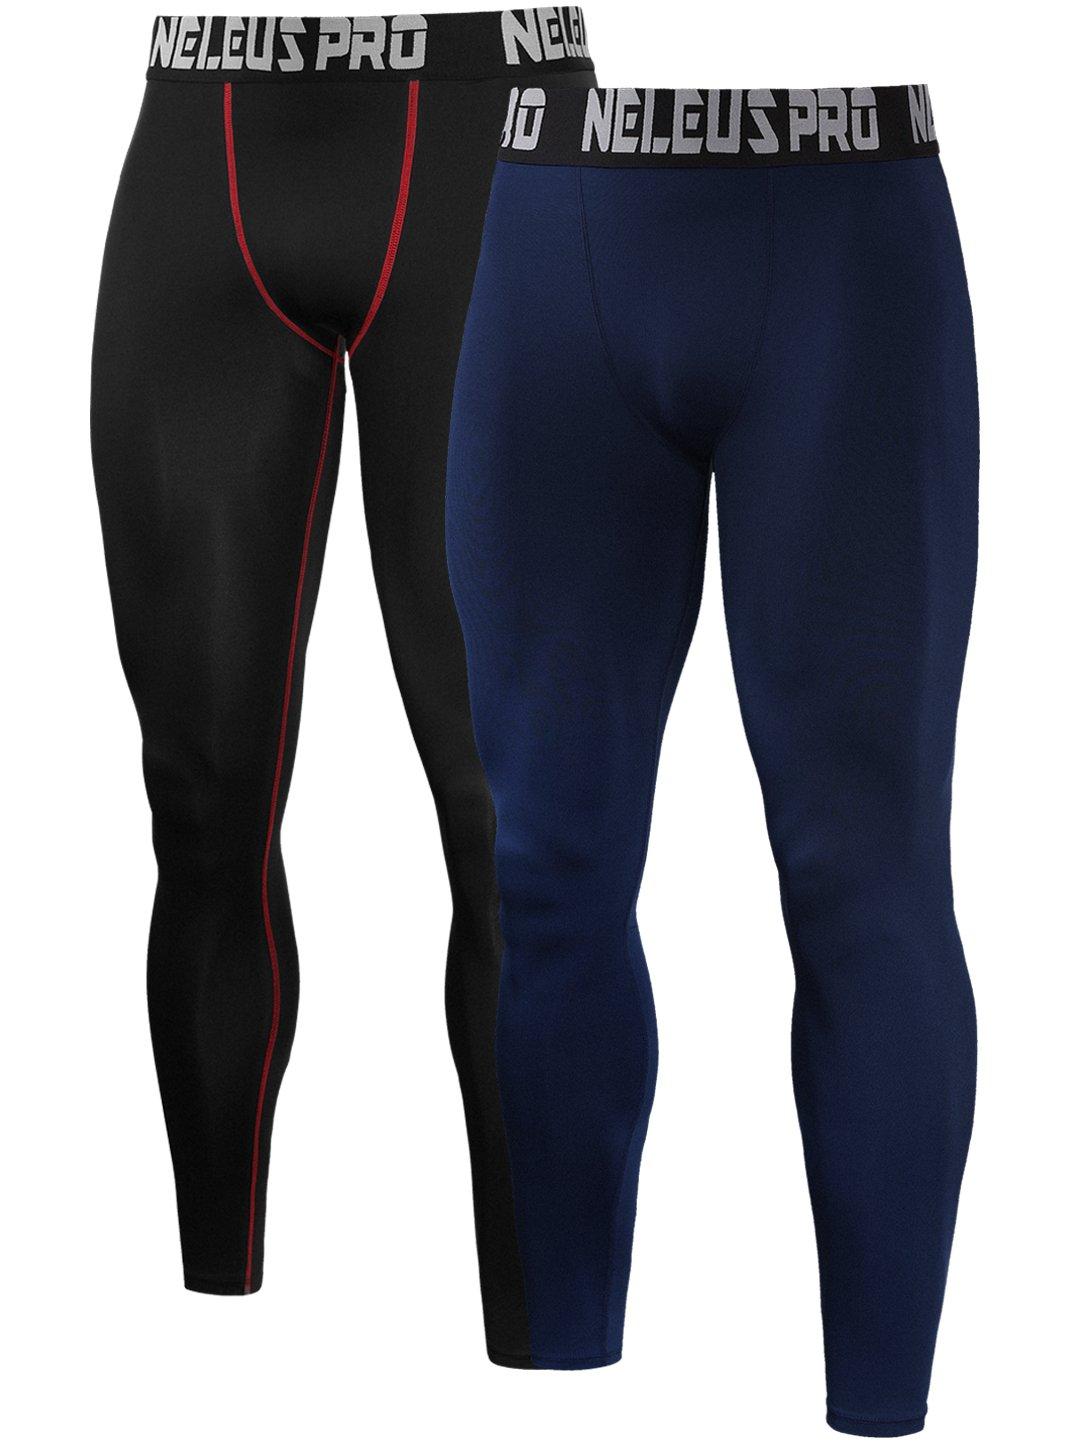 Neleus Men's 2 Pack Compression Tights Sport Running Leggings Pants,6019,Black(Red Stripe),Navy Blue,US S,EU M